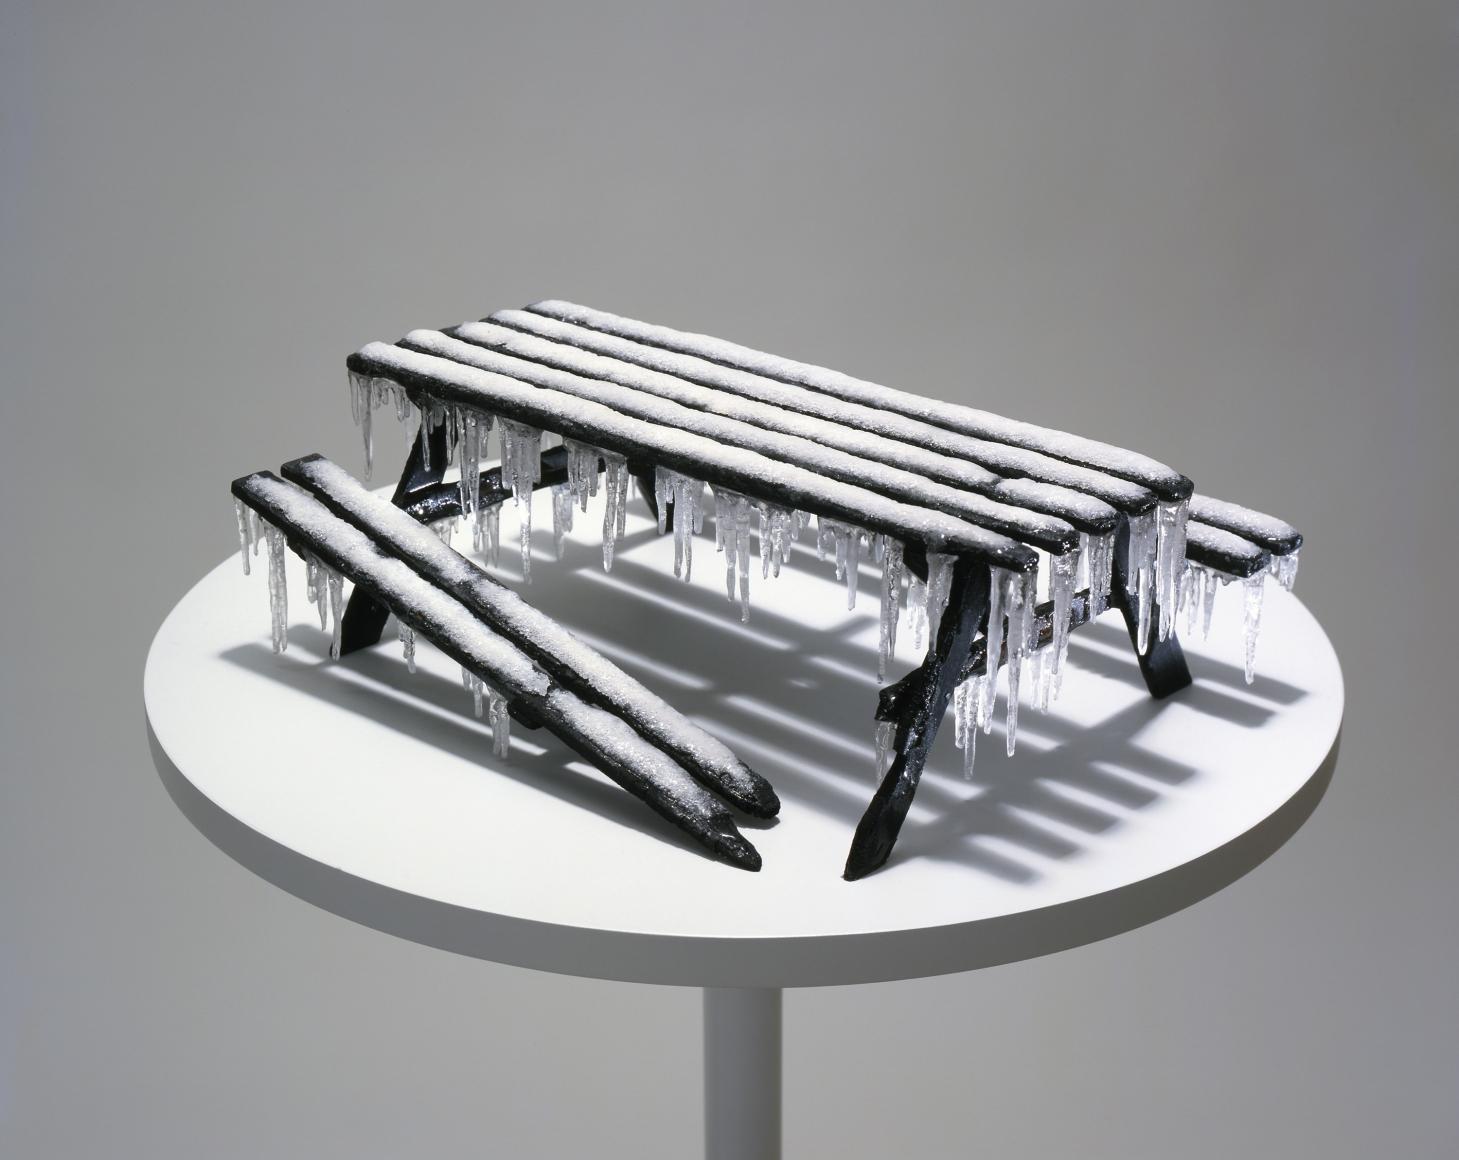 VINCENT MAZEAU, Model for Solitude, 2005